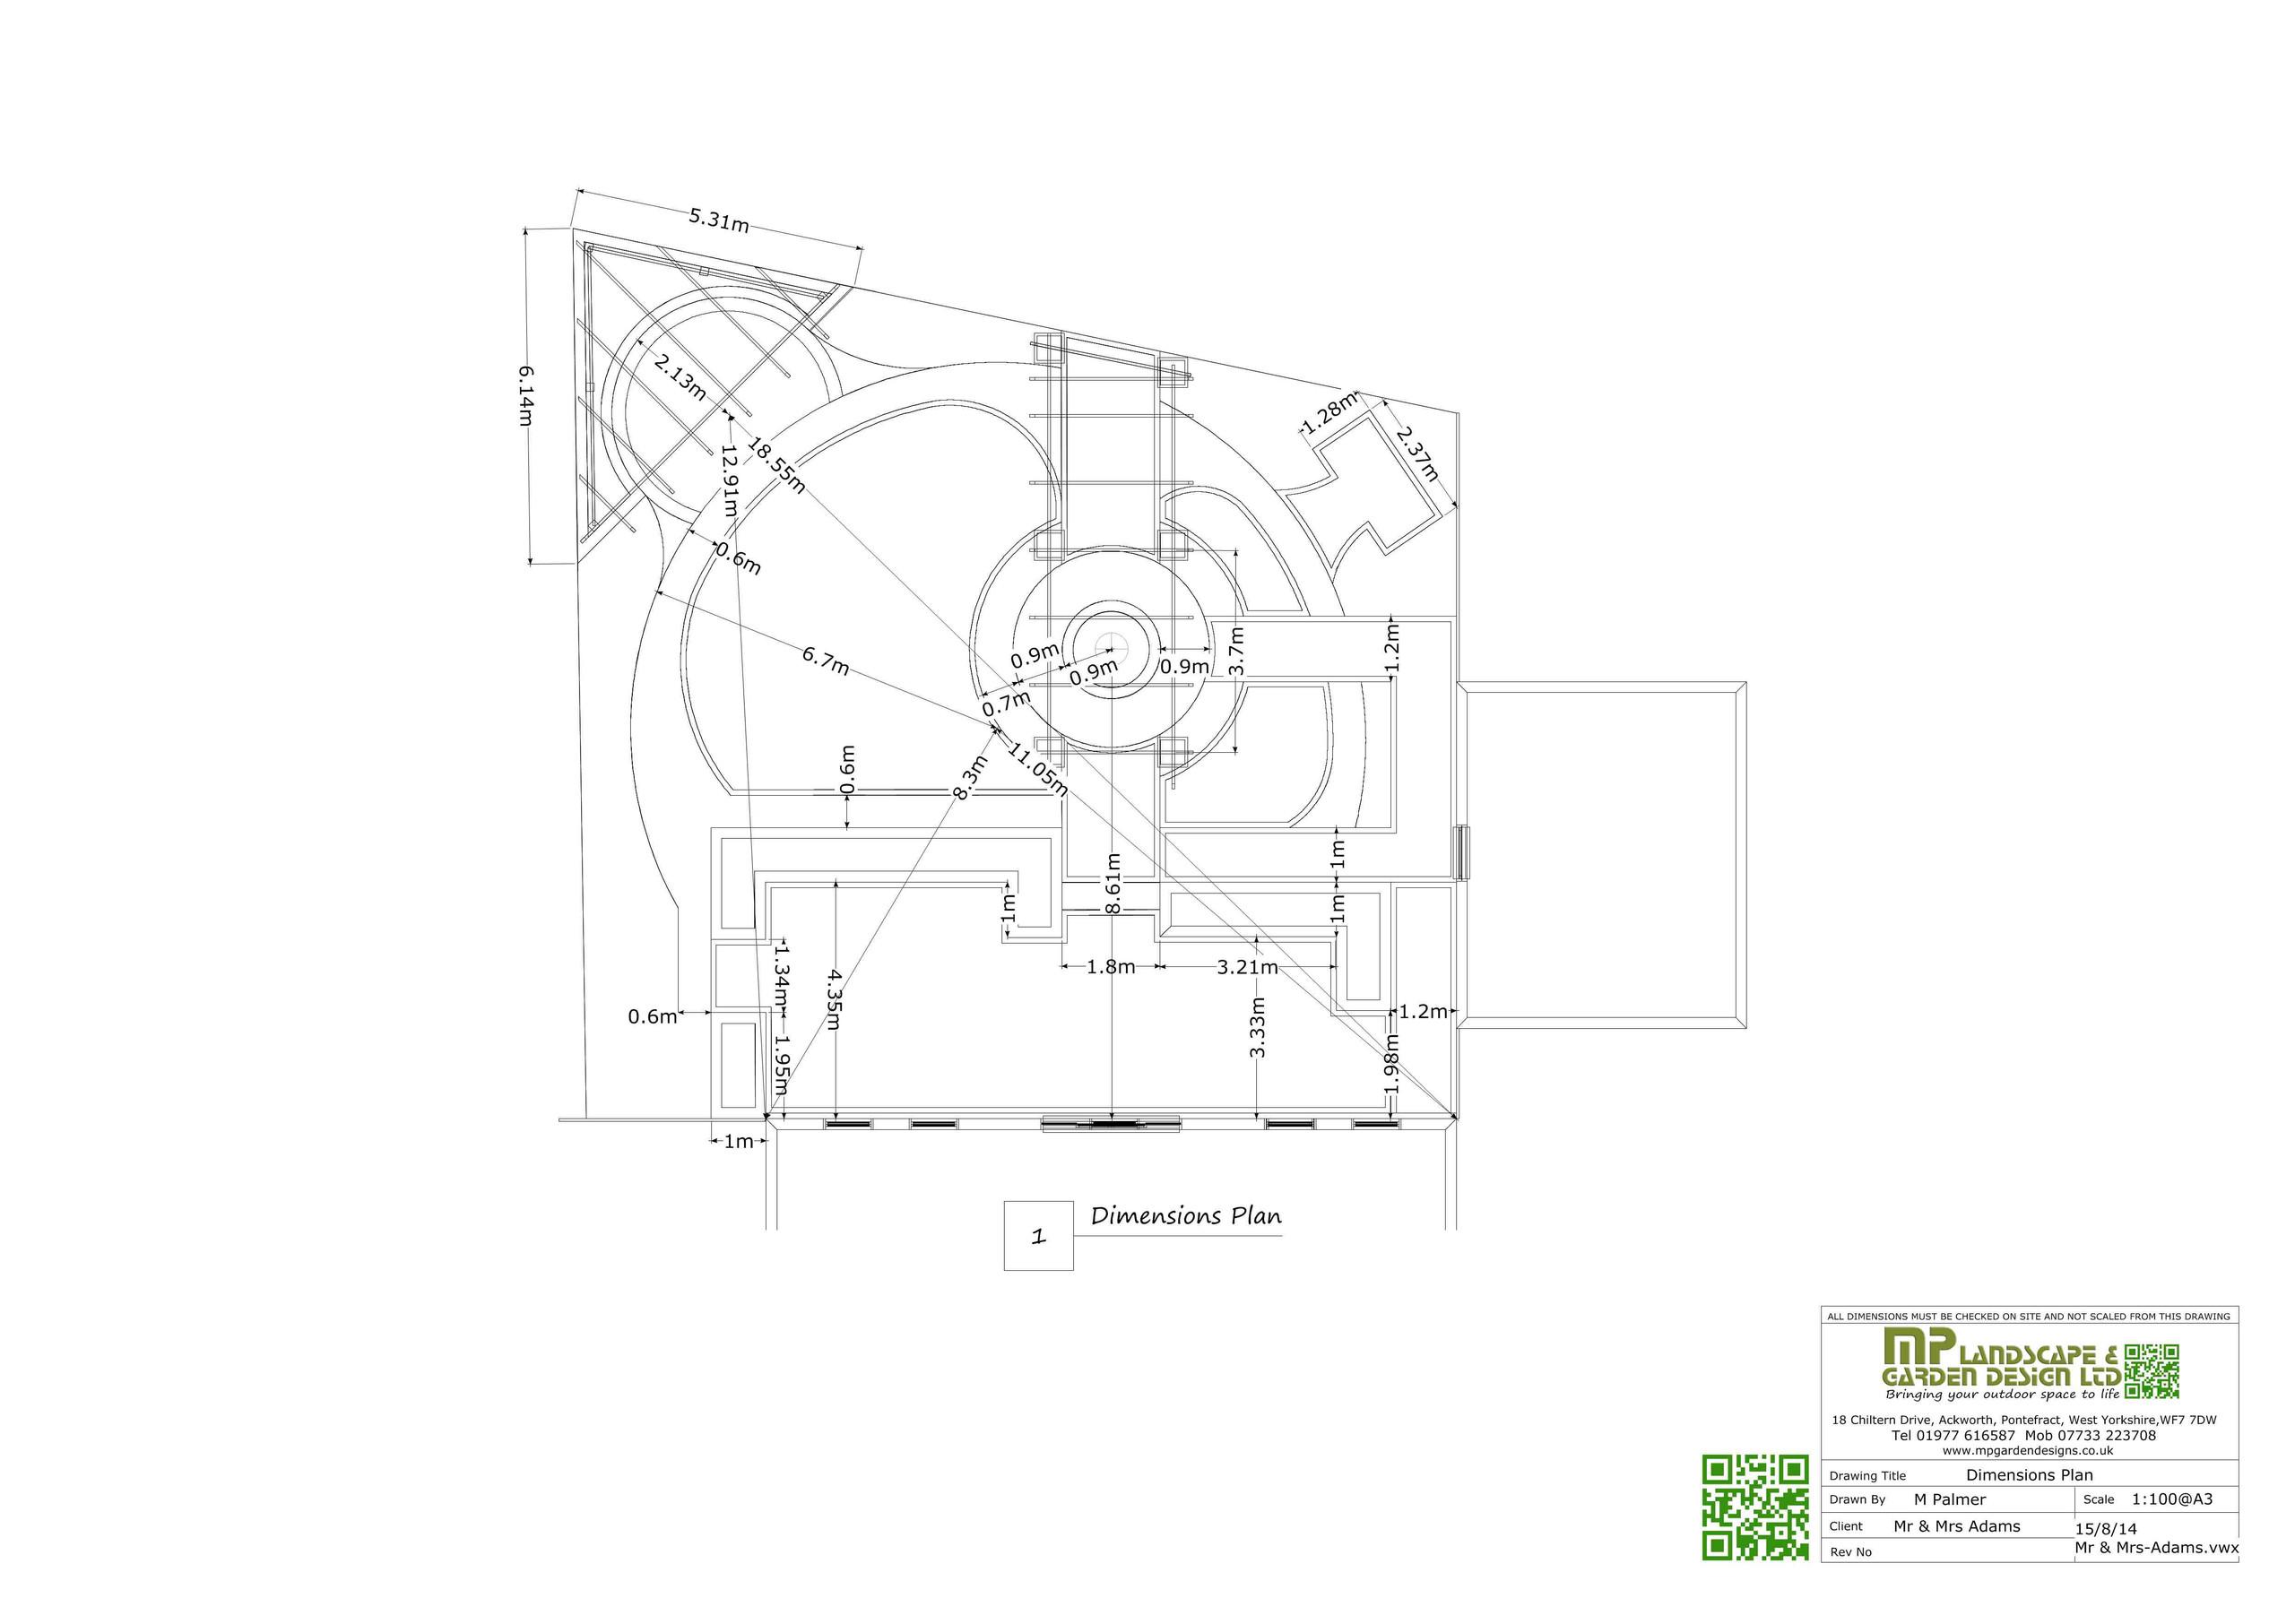 Garden Design layout dimensions plans for a garden in Wakefield